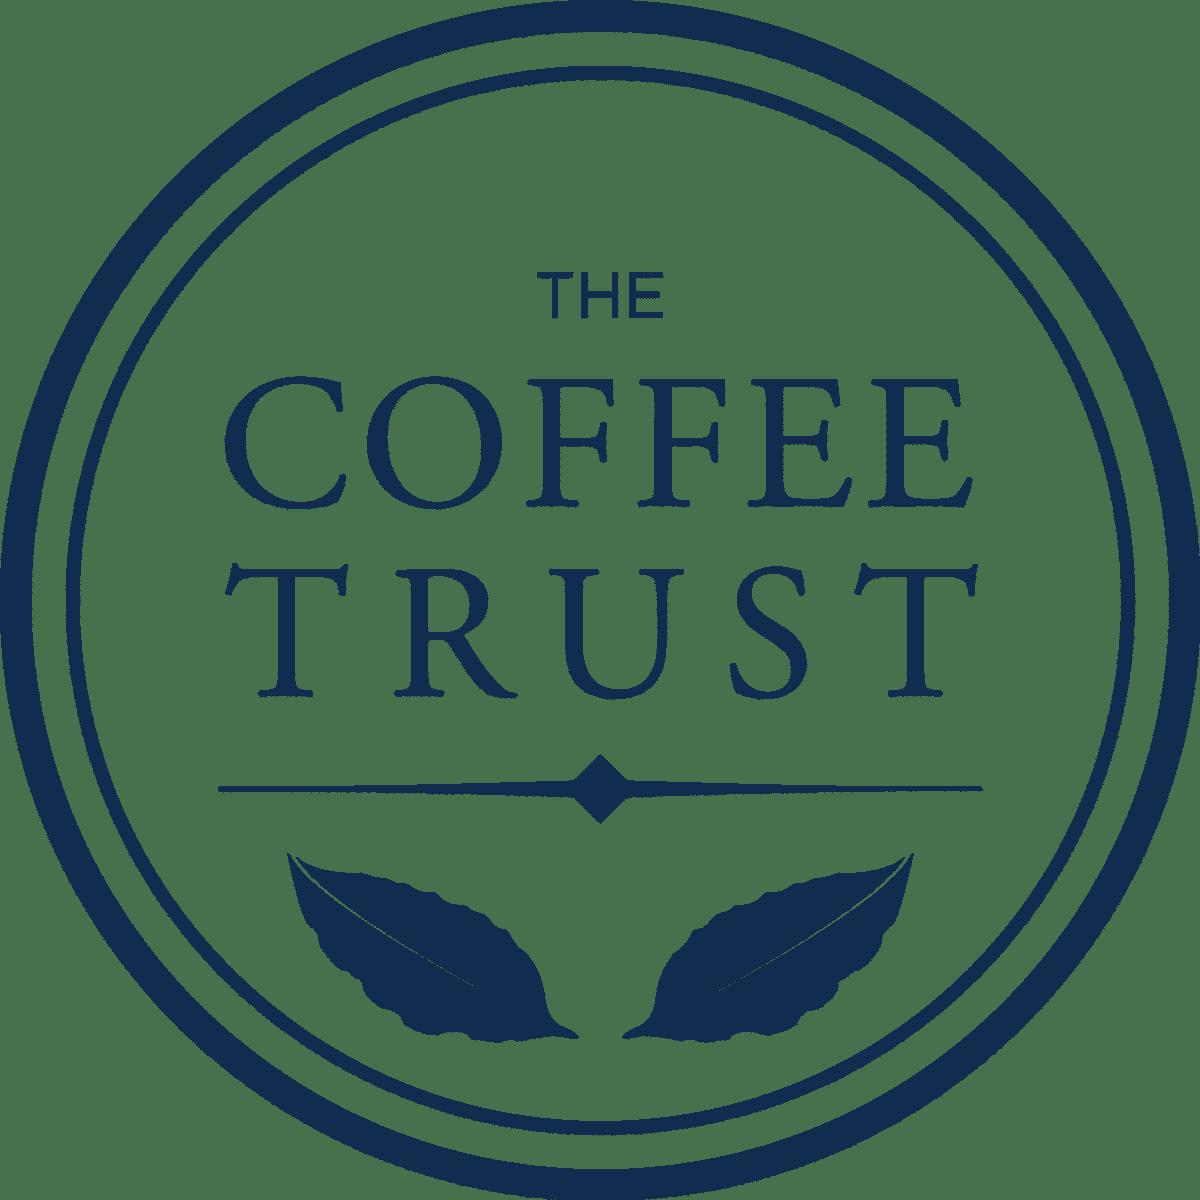 The Coffee Trust logo